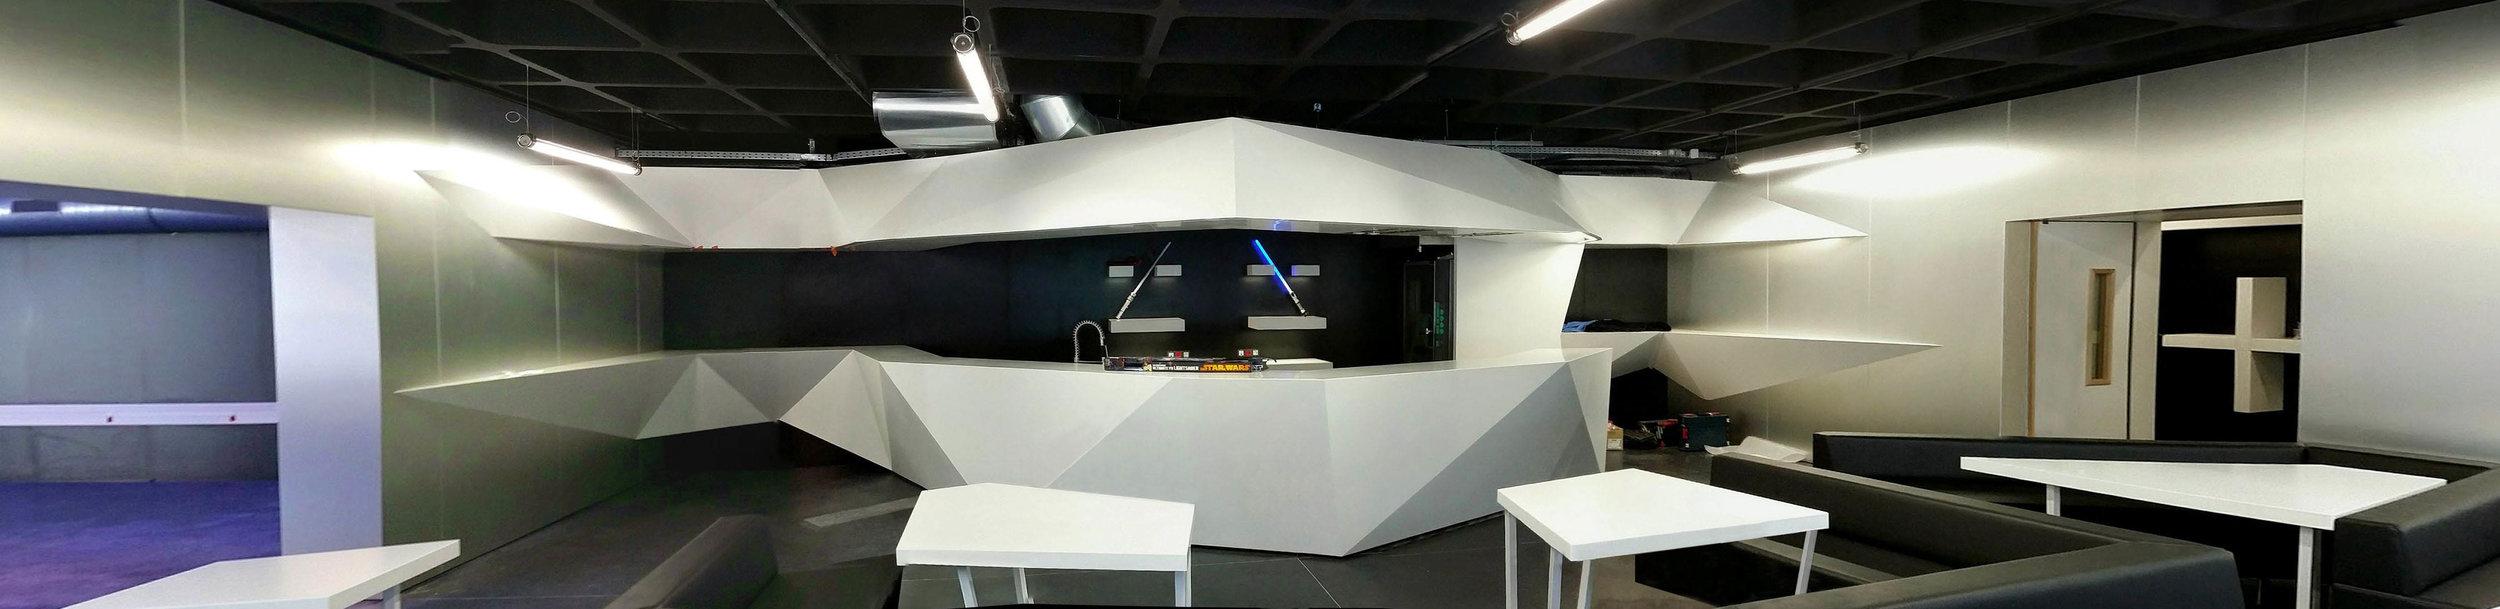 Ecole 42 - NOC 42 - AR Studio Architectures - Xavier NIEL - Kwame YAMGNANE - Florian BUCHER - Nicolas SADIRAC - Free - Reinventer Paris (13).jpg